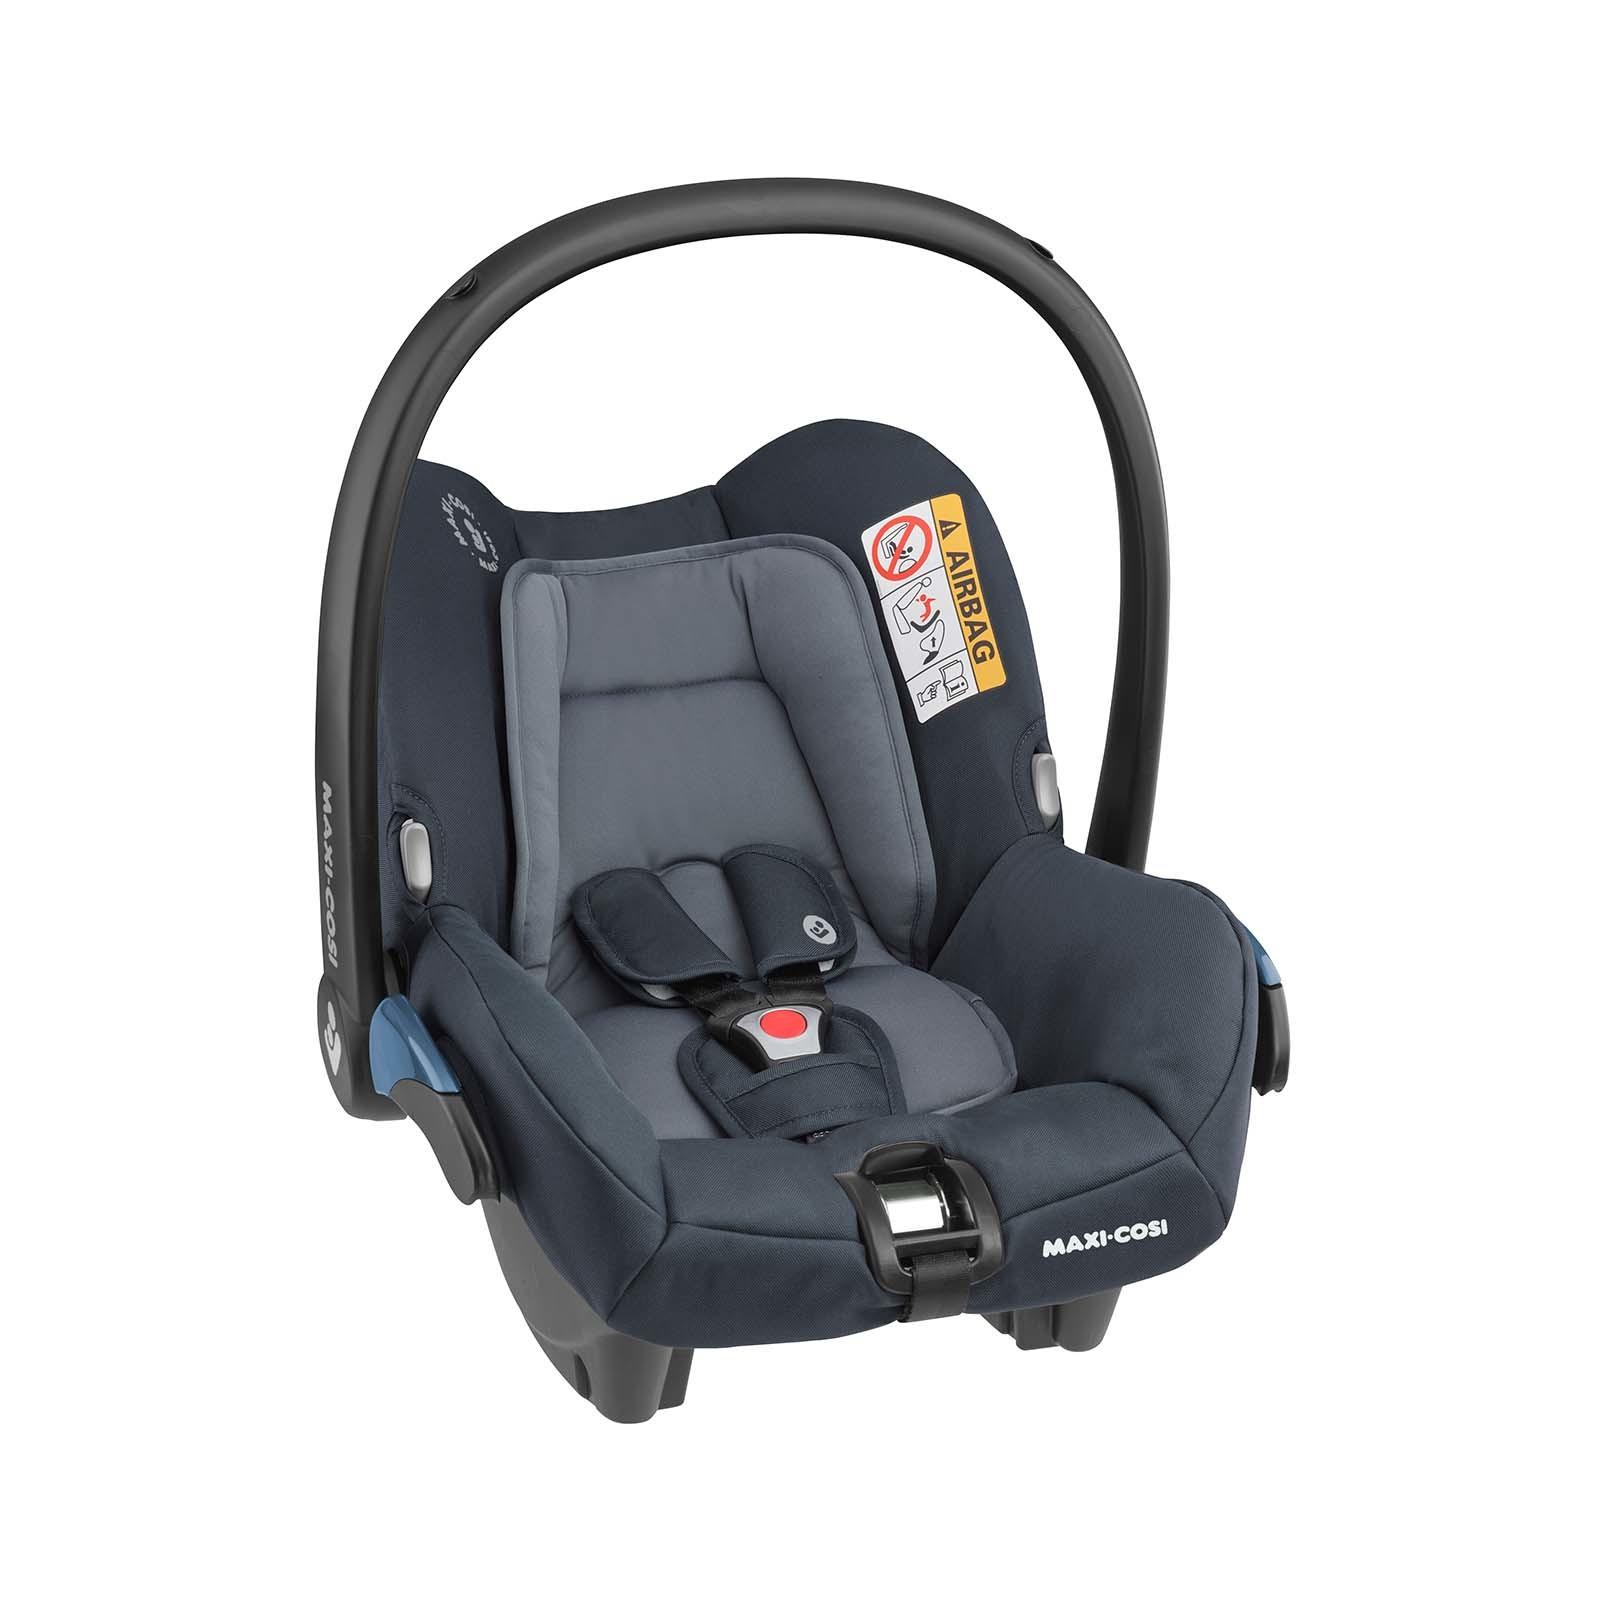 Bebê Conforto Citi c/ Base - 0 à 13 Kg - Essential Graphite - Maxi Cosi